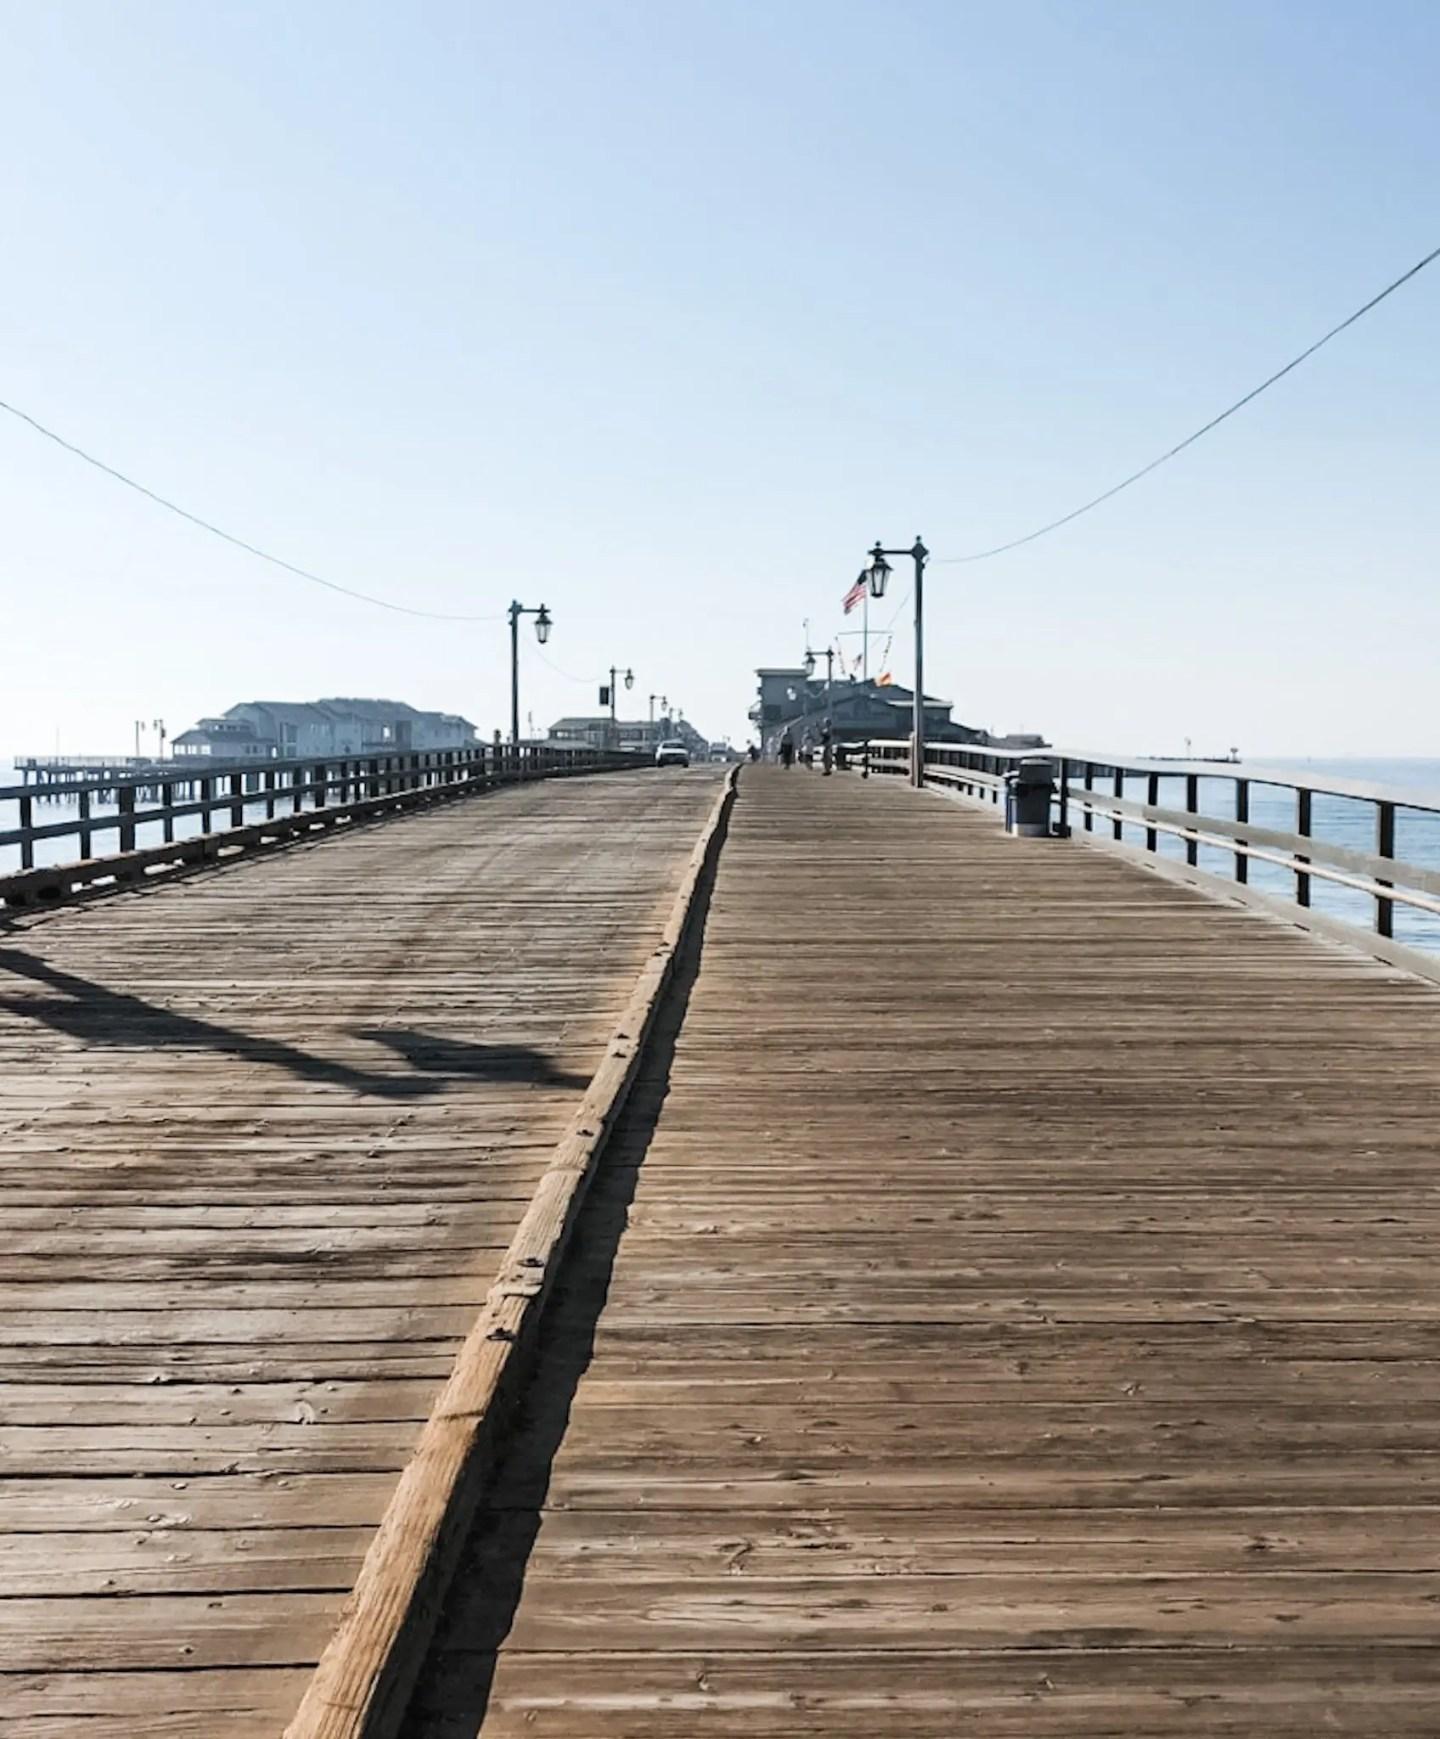 Our road trip to Santa Barbara led us here - the bridge to Stearn's Wharf.